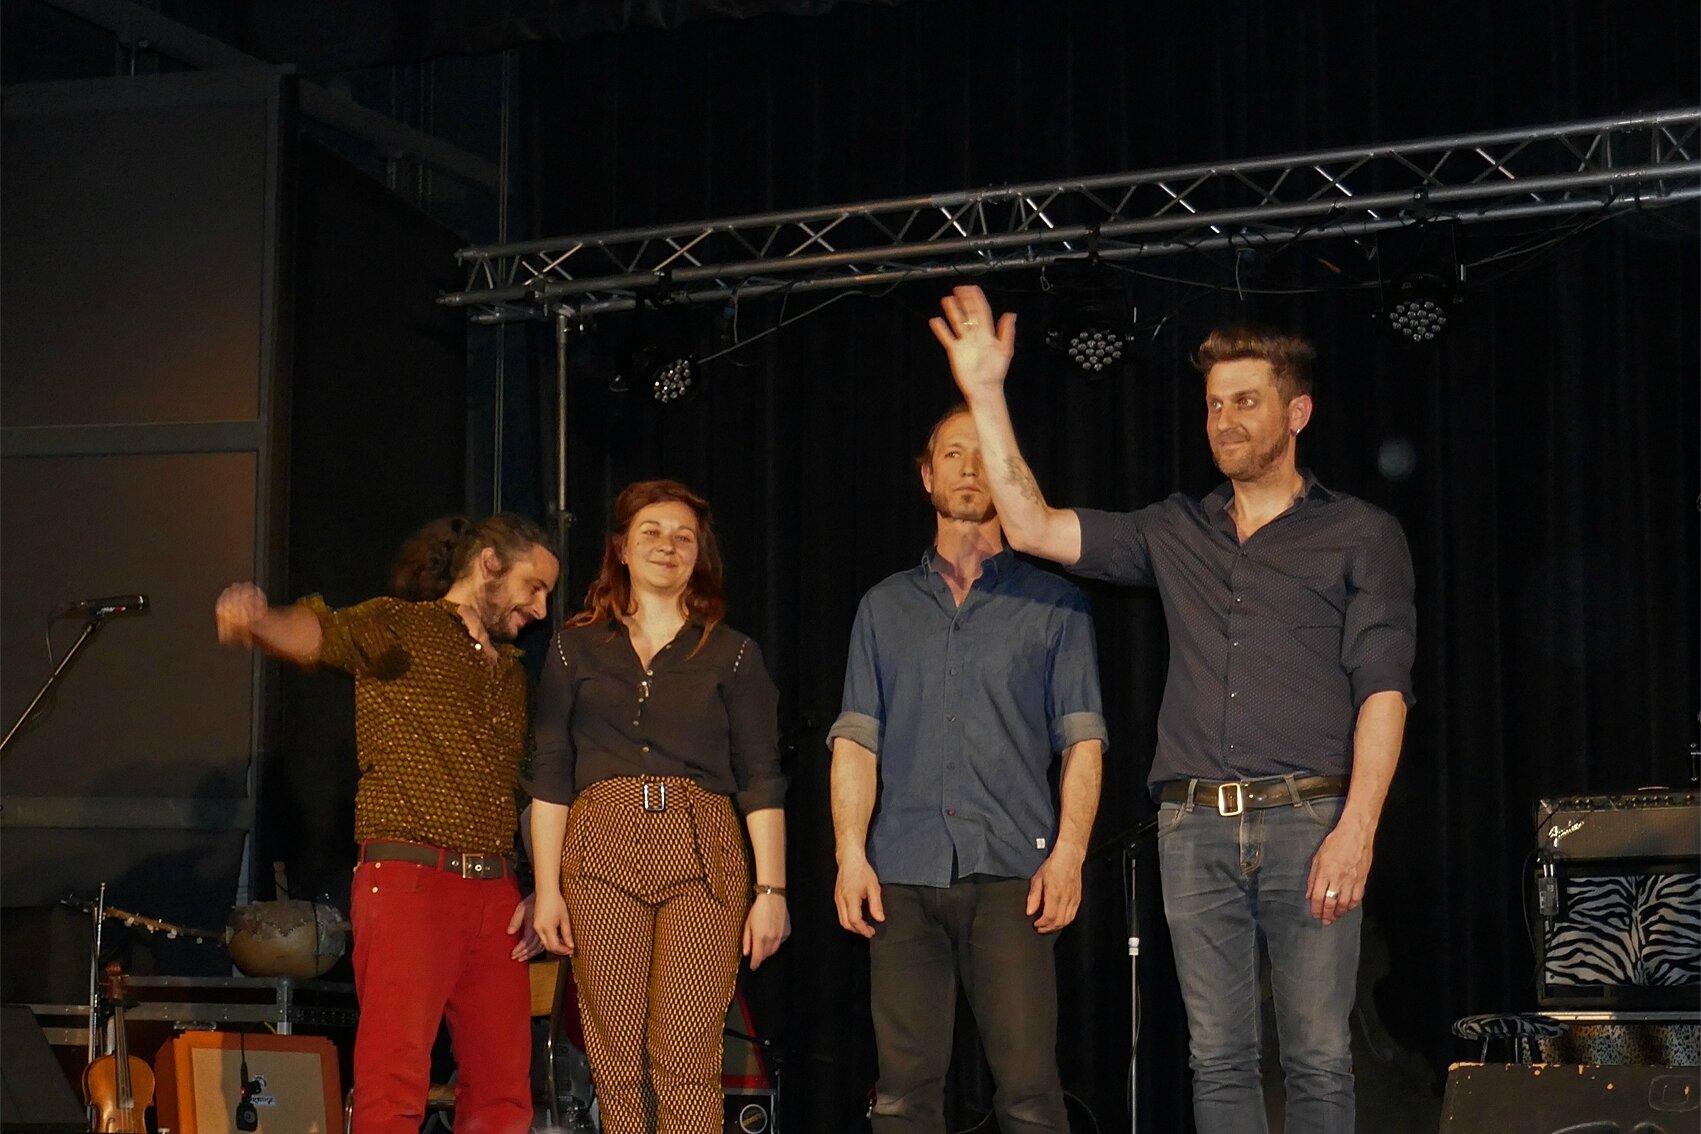 Télégram = Concert 17 mars 2018 Caudrot - Gérard GUTIERREZ (26)